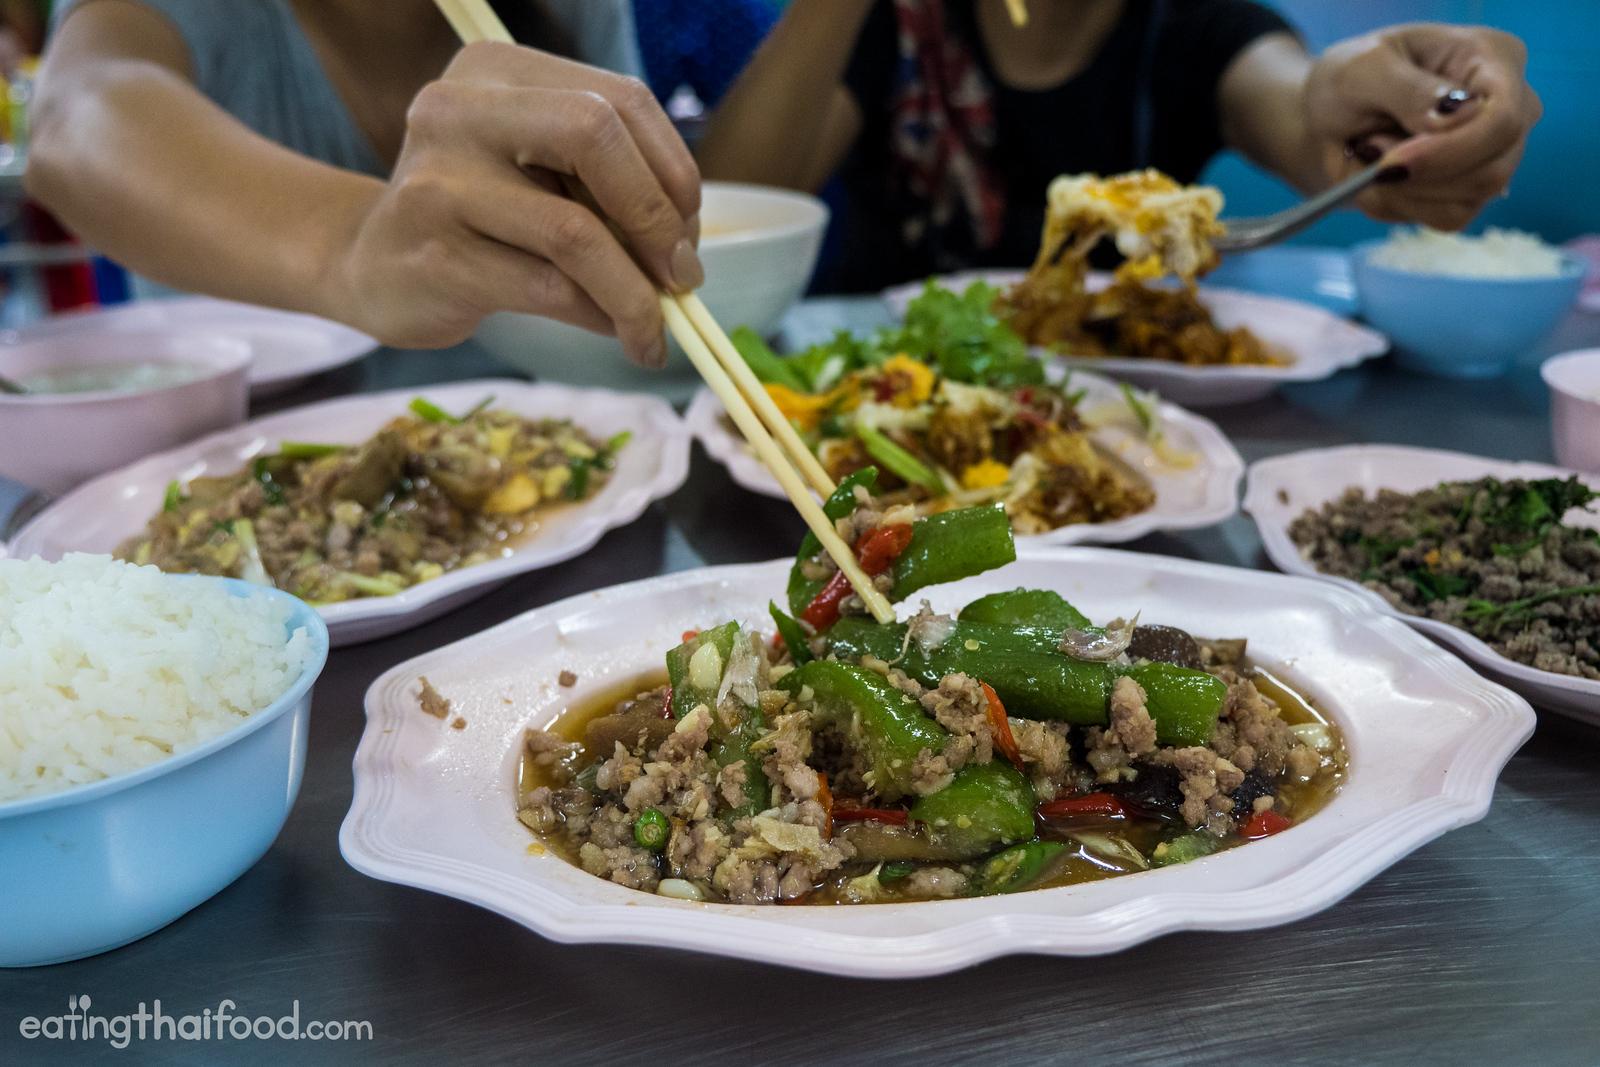 Thai eggplant dish